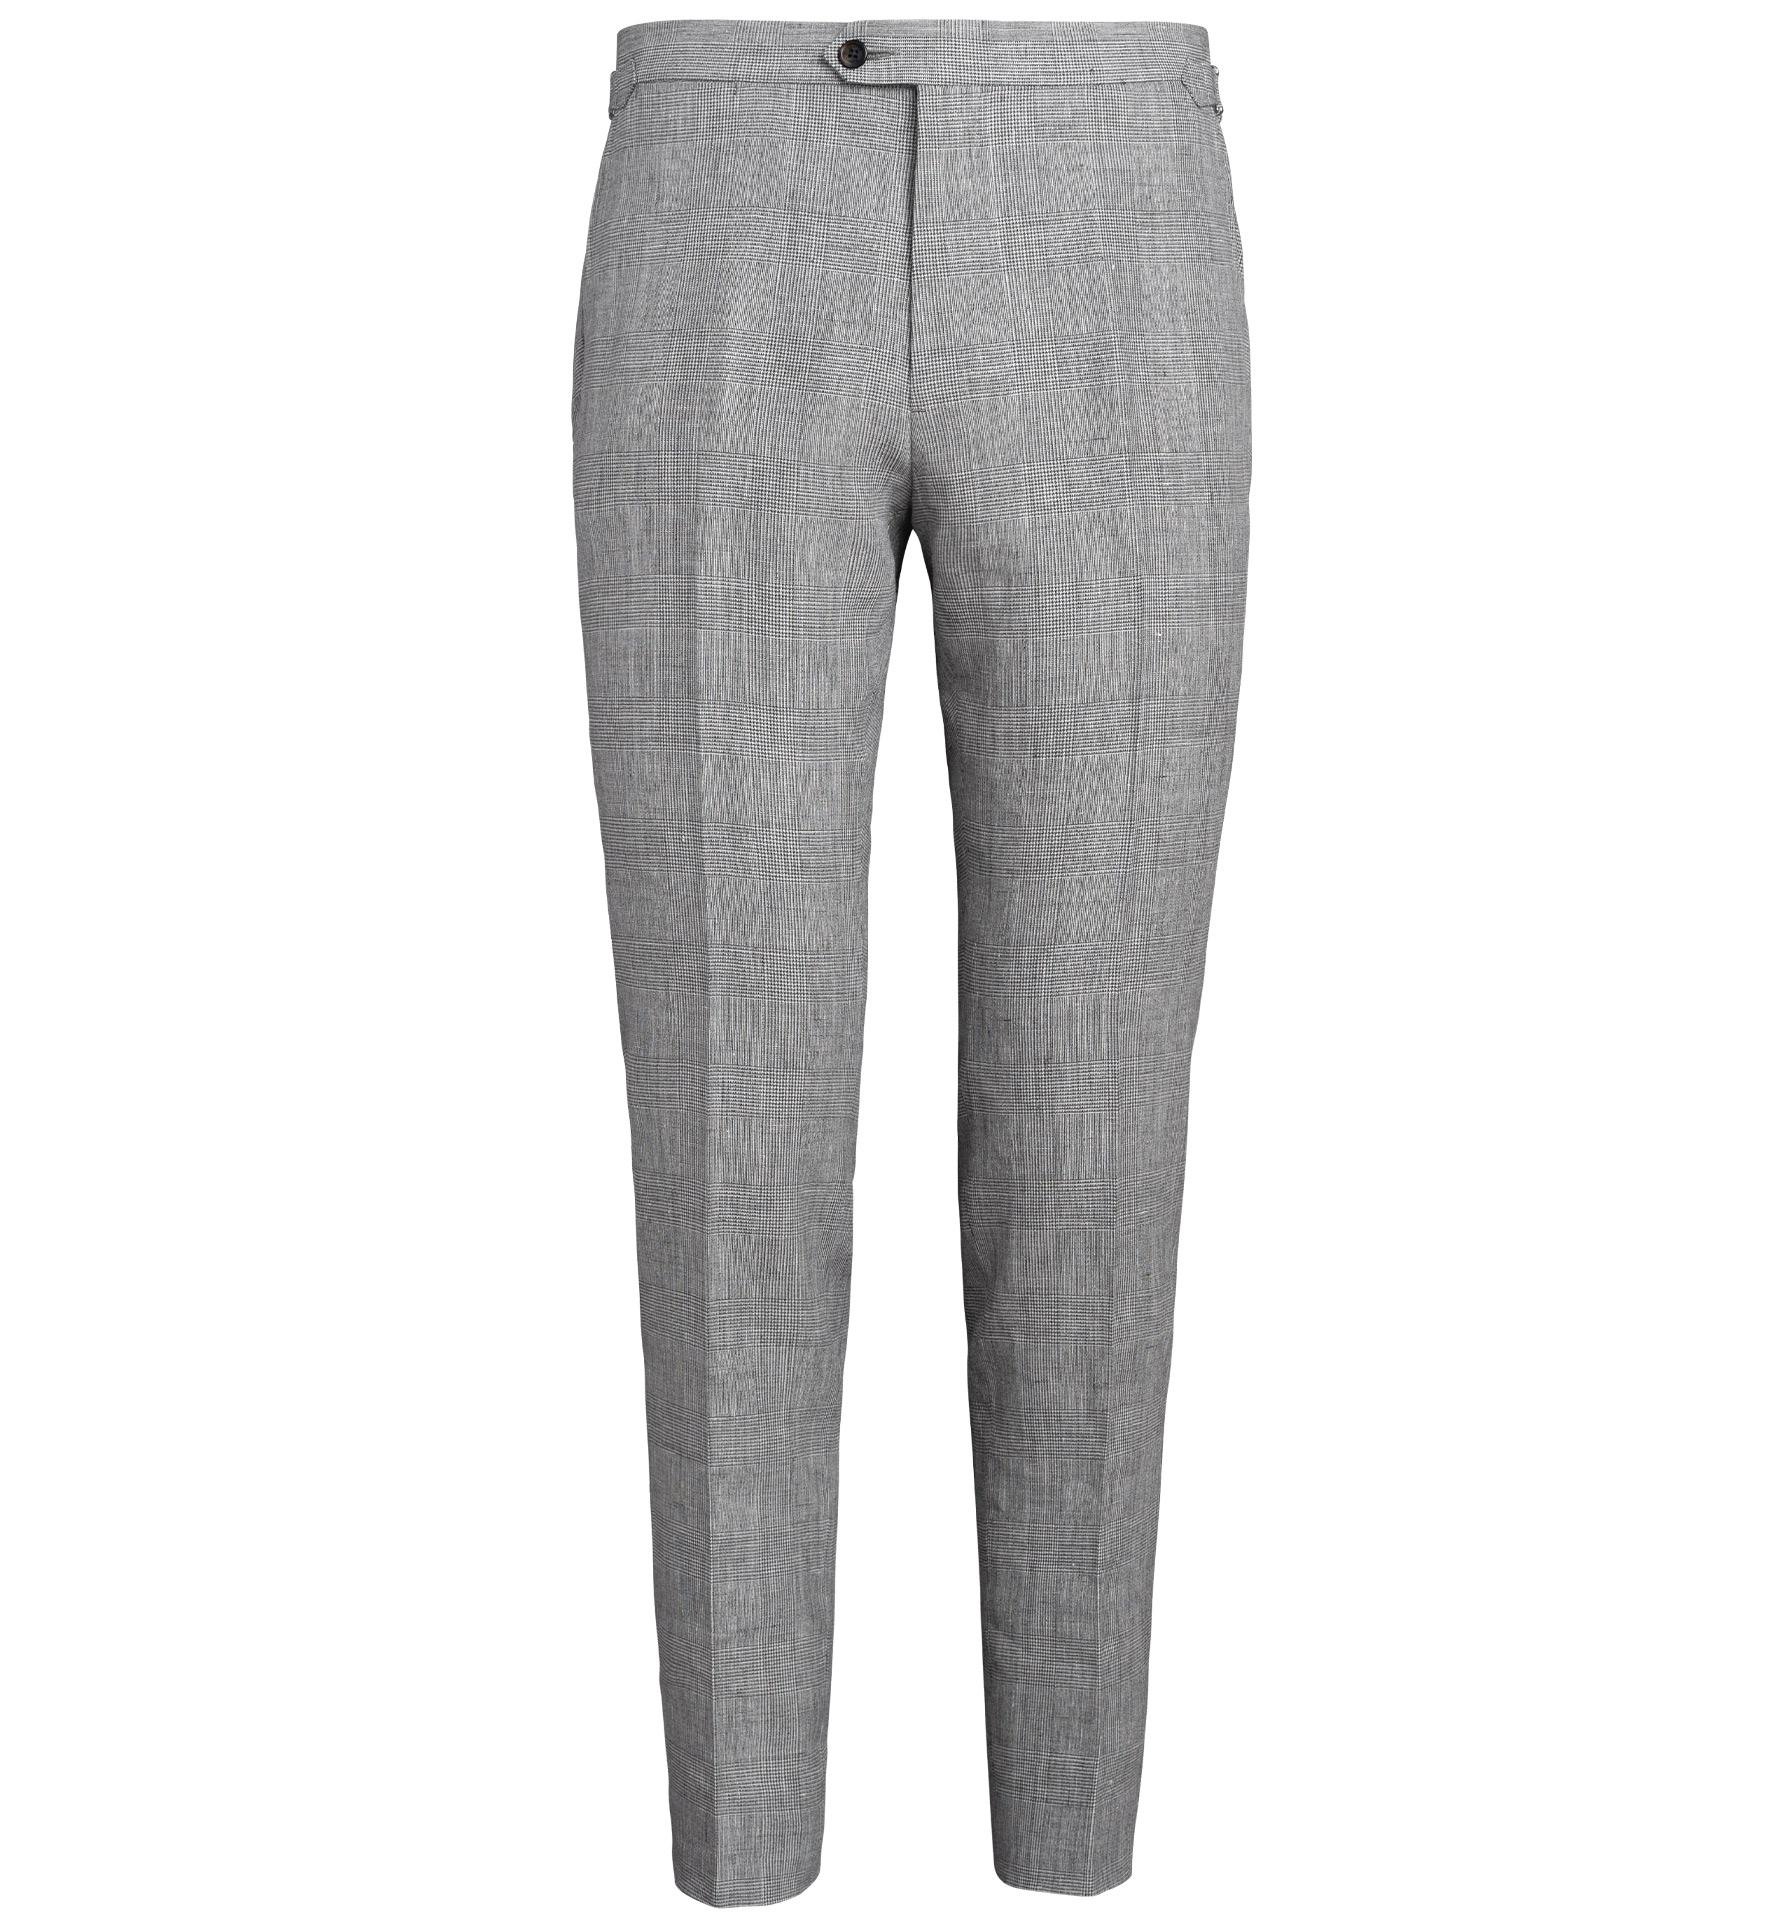 Zoom Image of Allen Light Grey Glen Plaid Wool and Linen Trouser